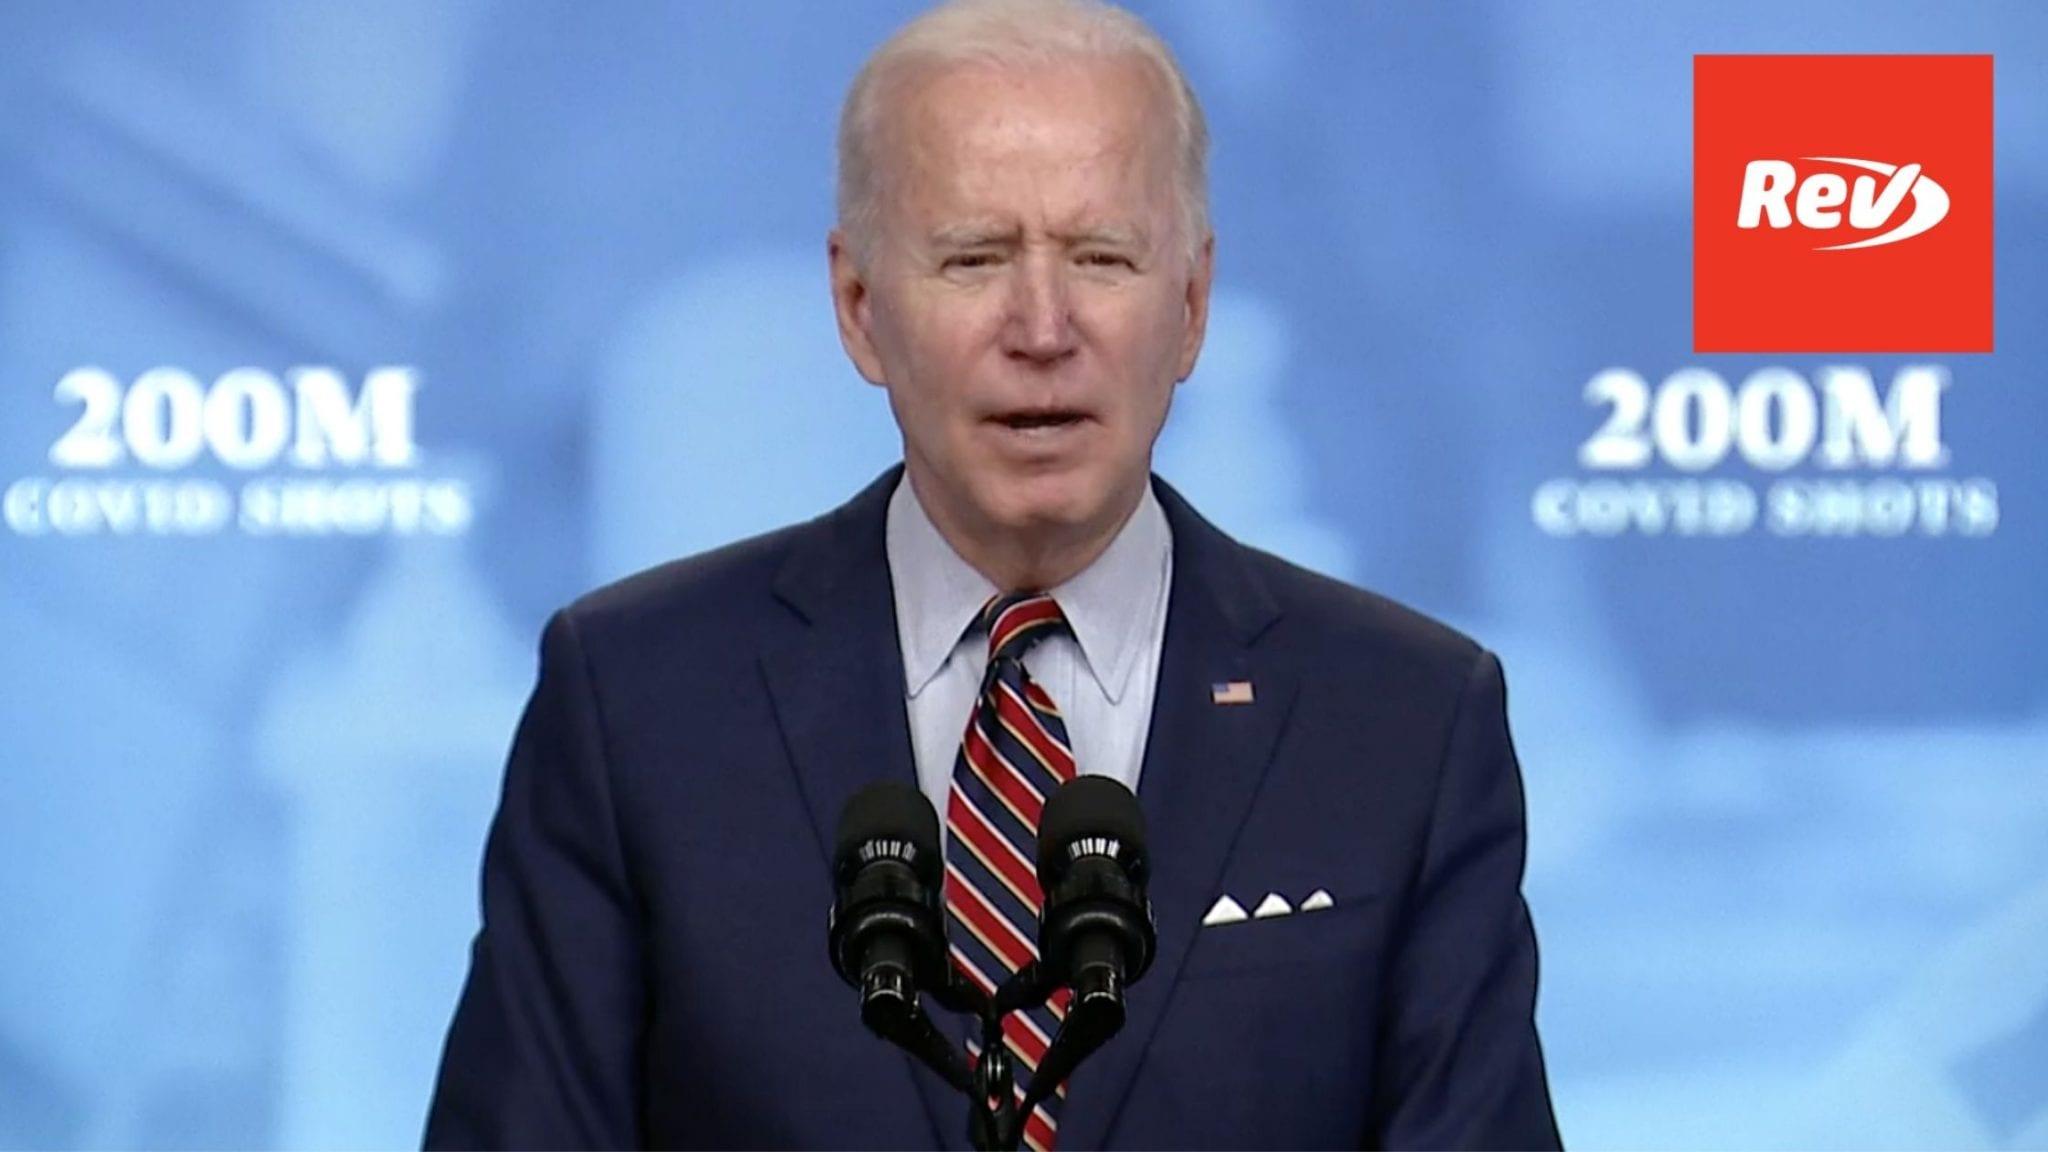 Joe Biden Speech Transcript April 21: 200 Million COVID-19 Vaccine Shots